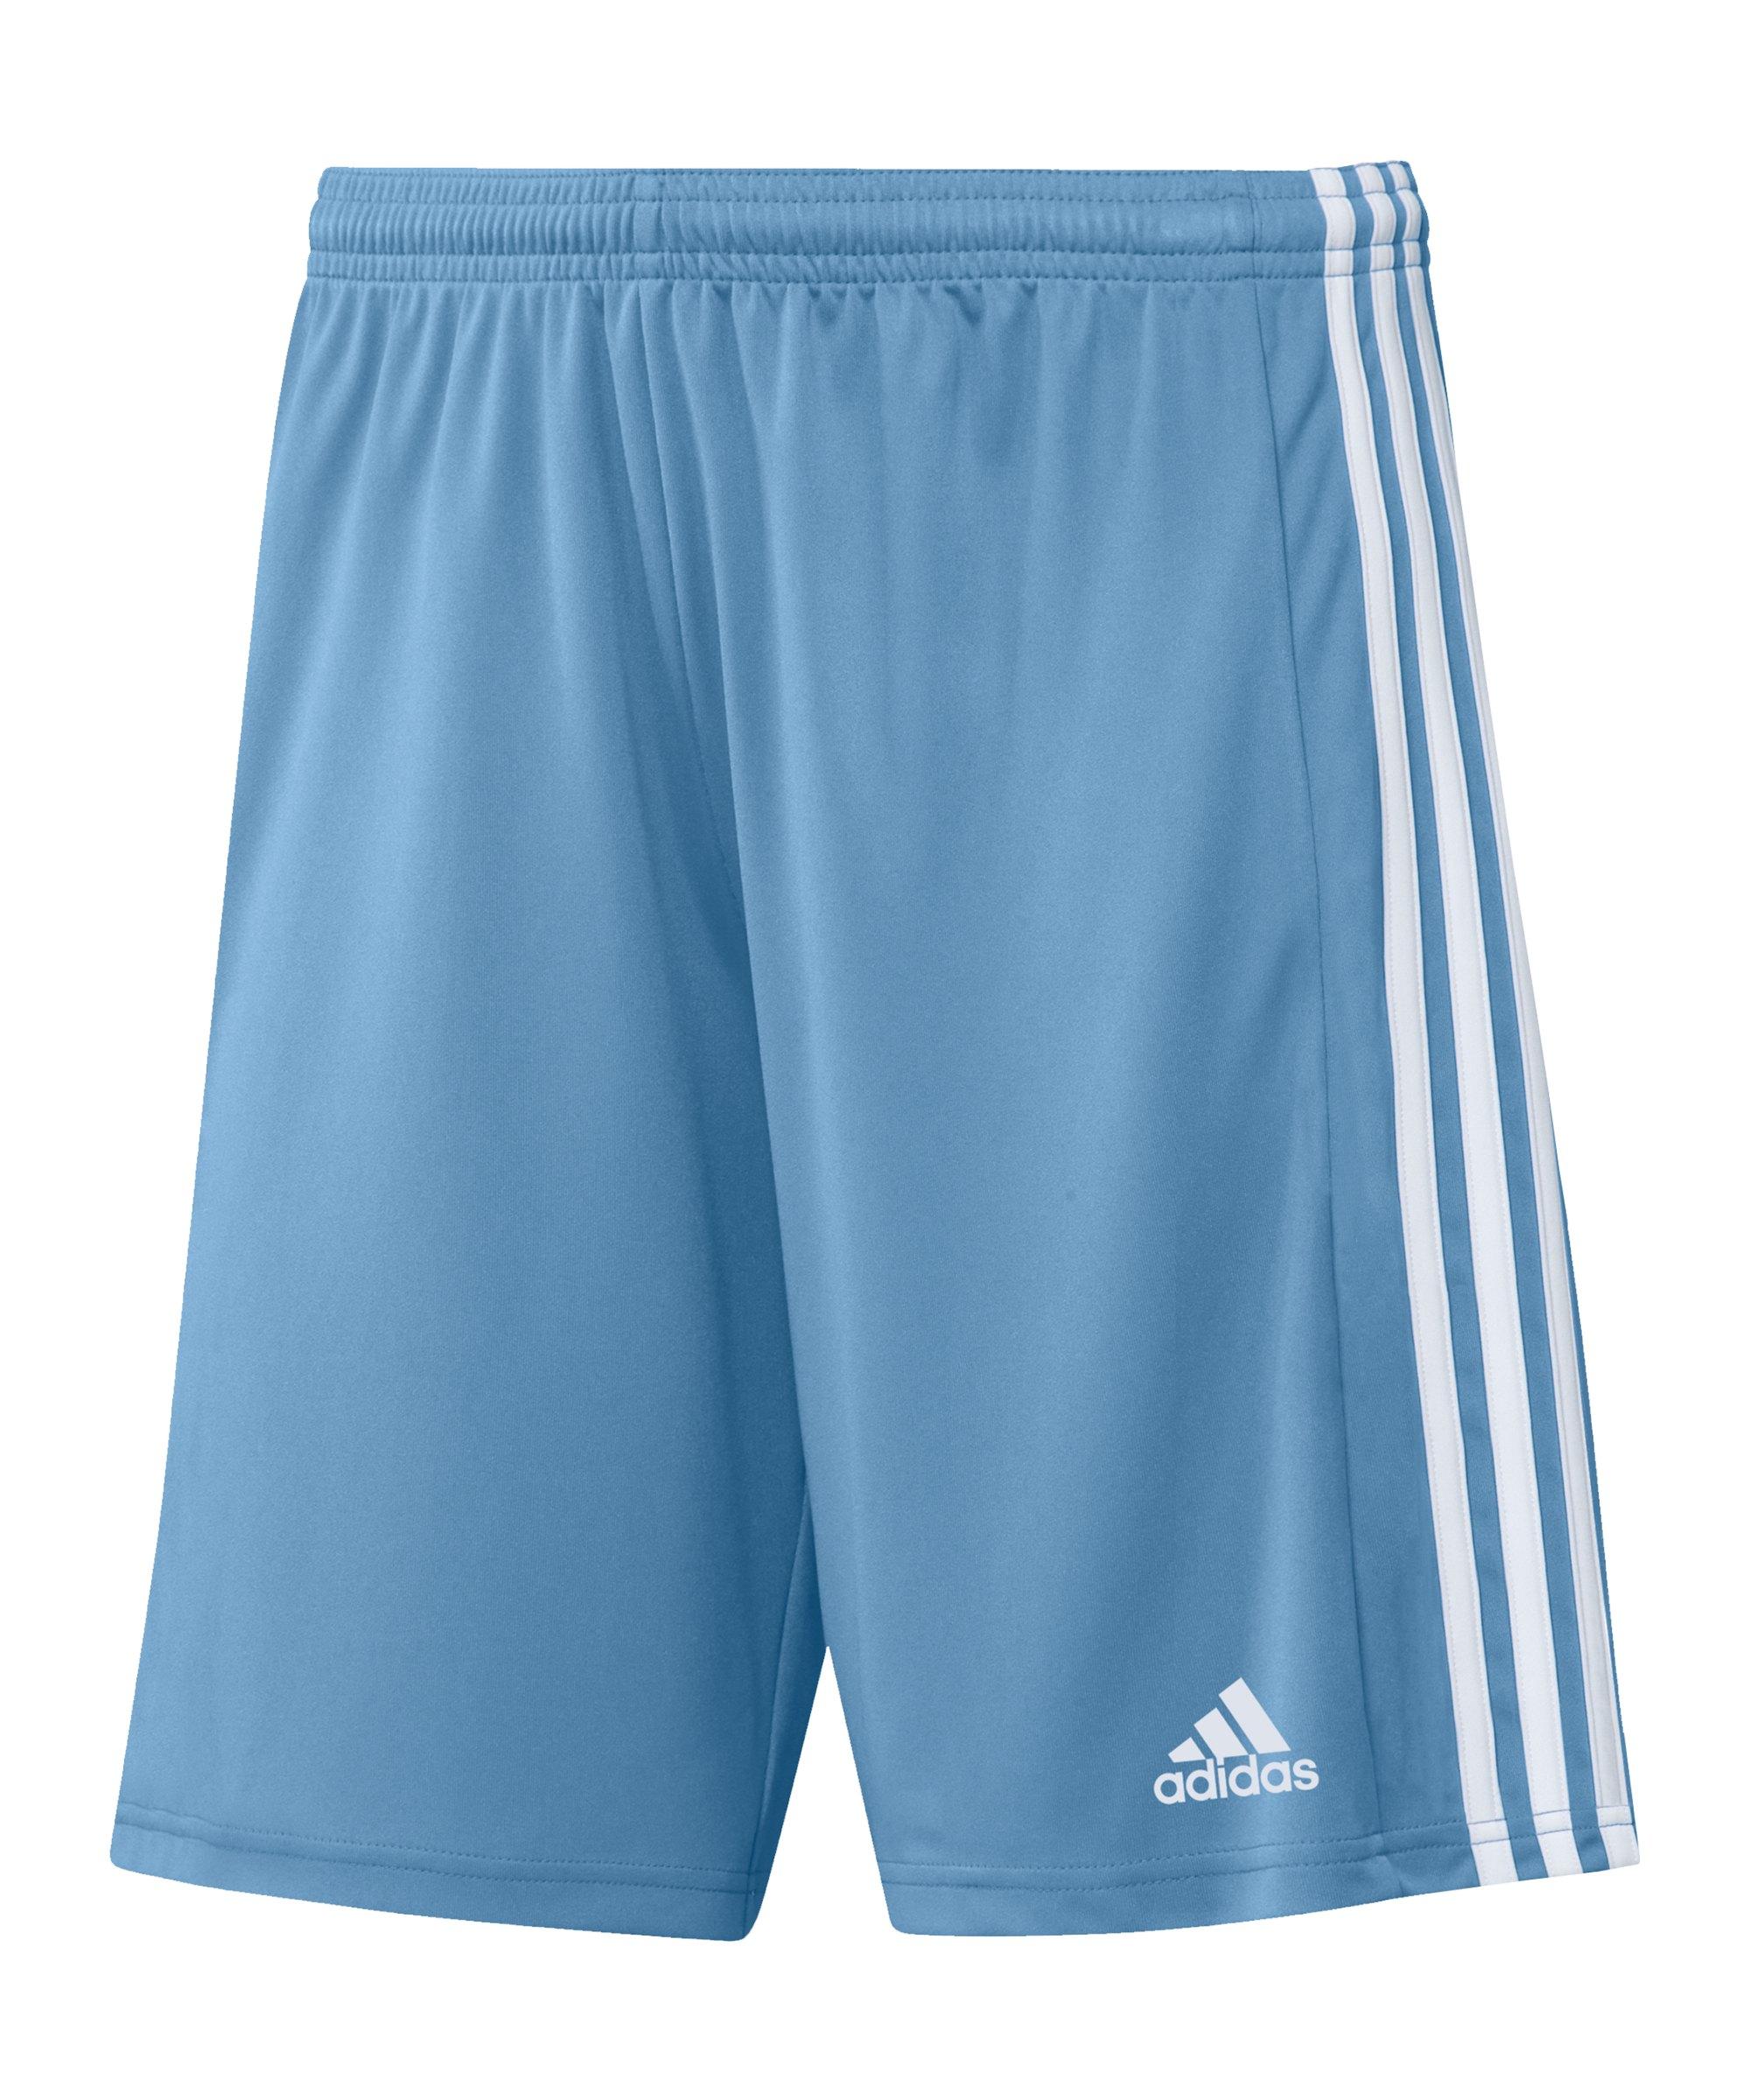 adidas Squadra 21 Short Hellblau Weiss - blau